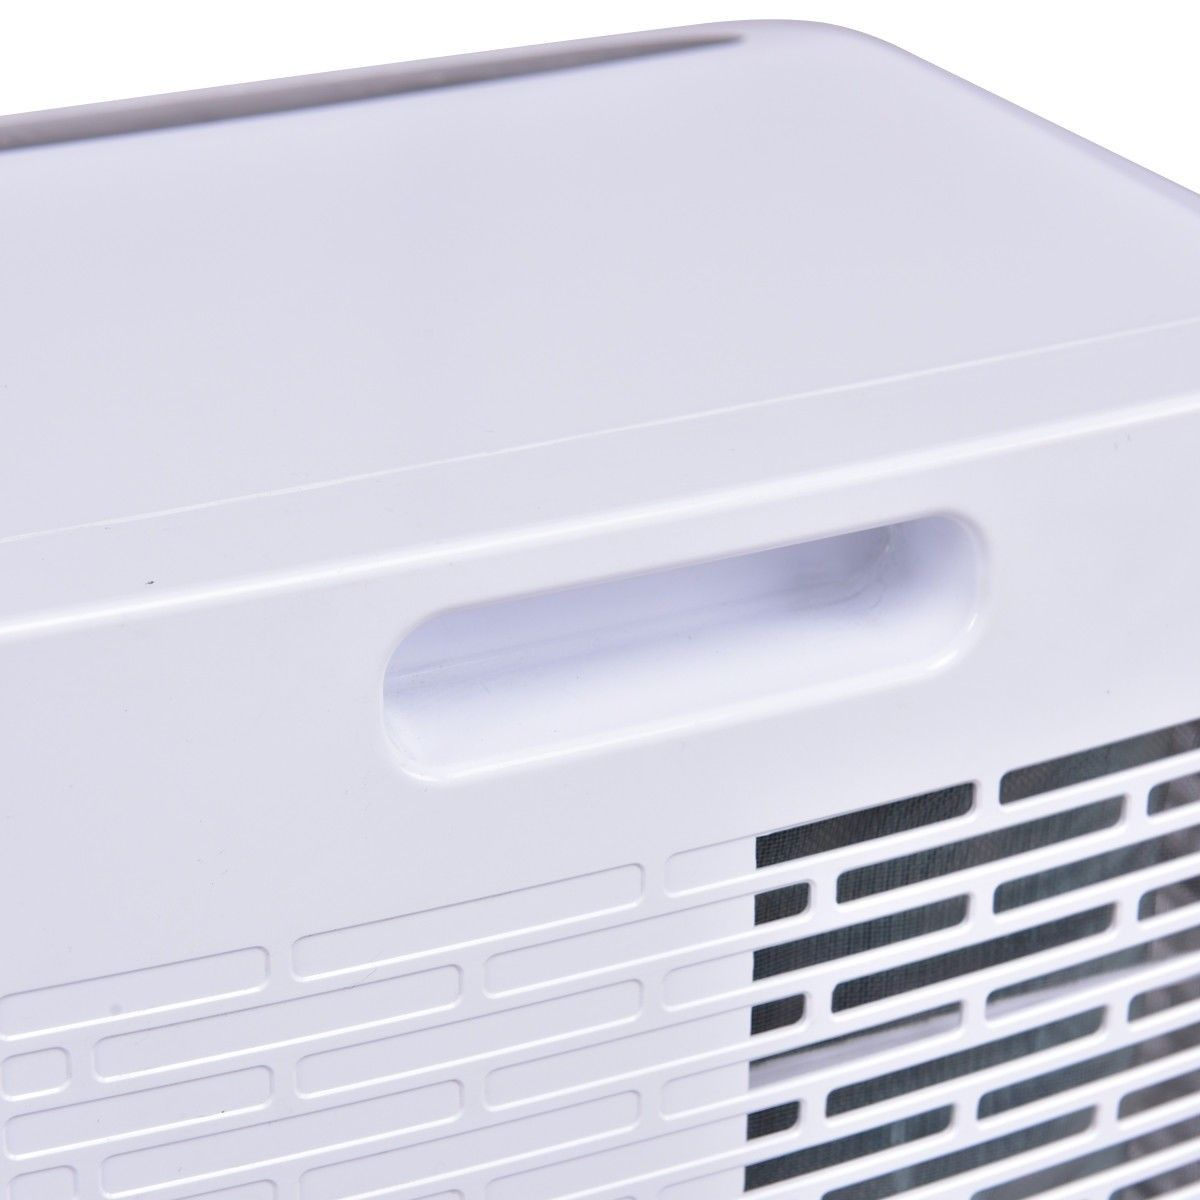 8 000 Btu Portable Air Conditioner Dehumidifier Portable Air Conditioner Dehumidifiers Air Conditioner